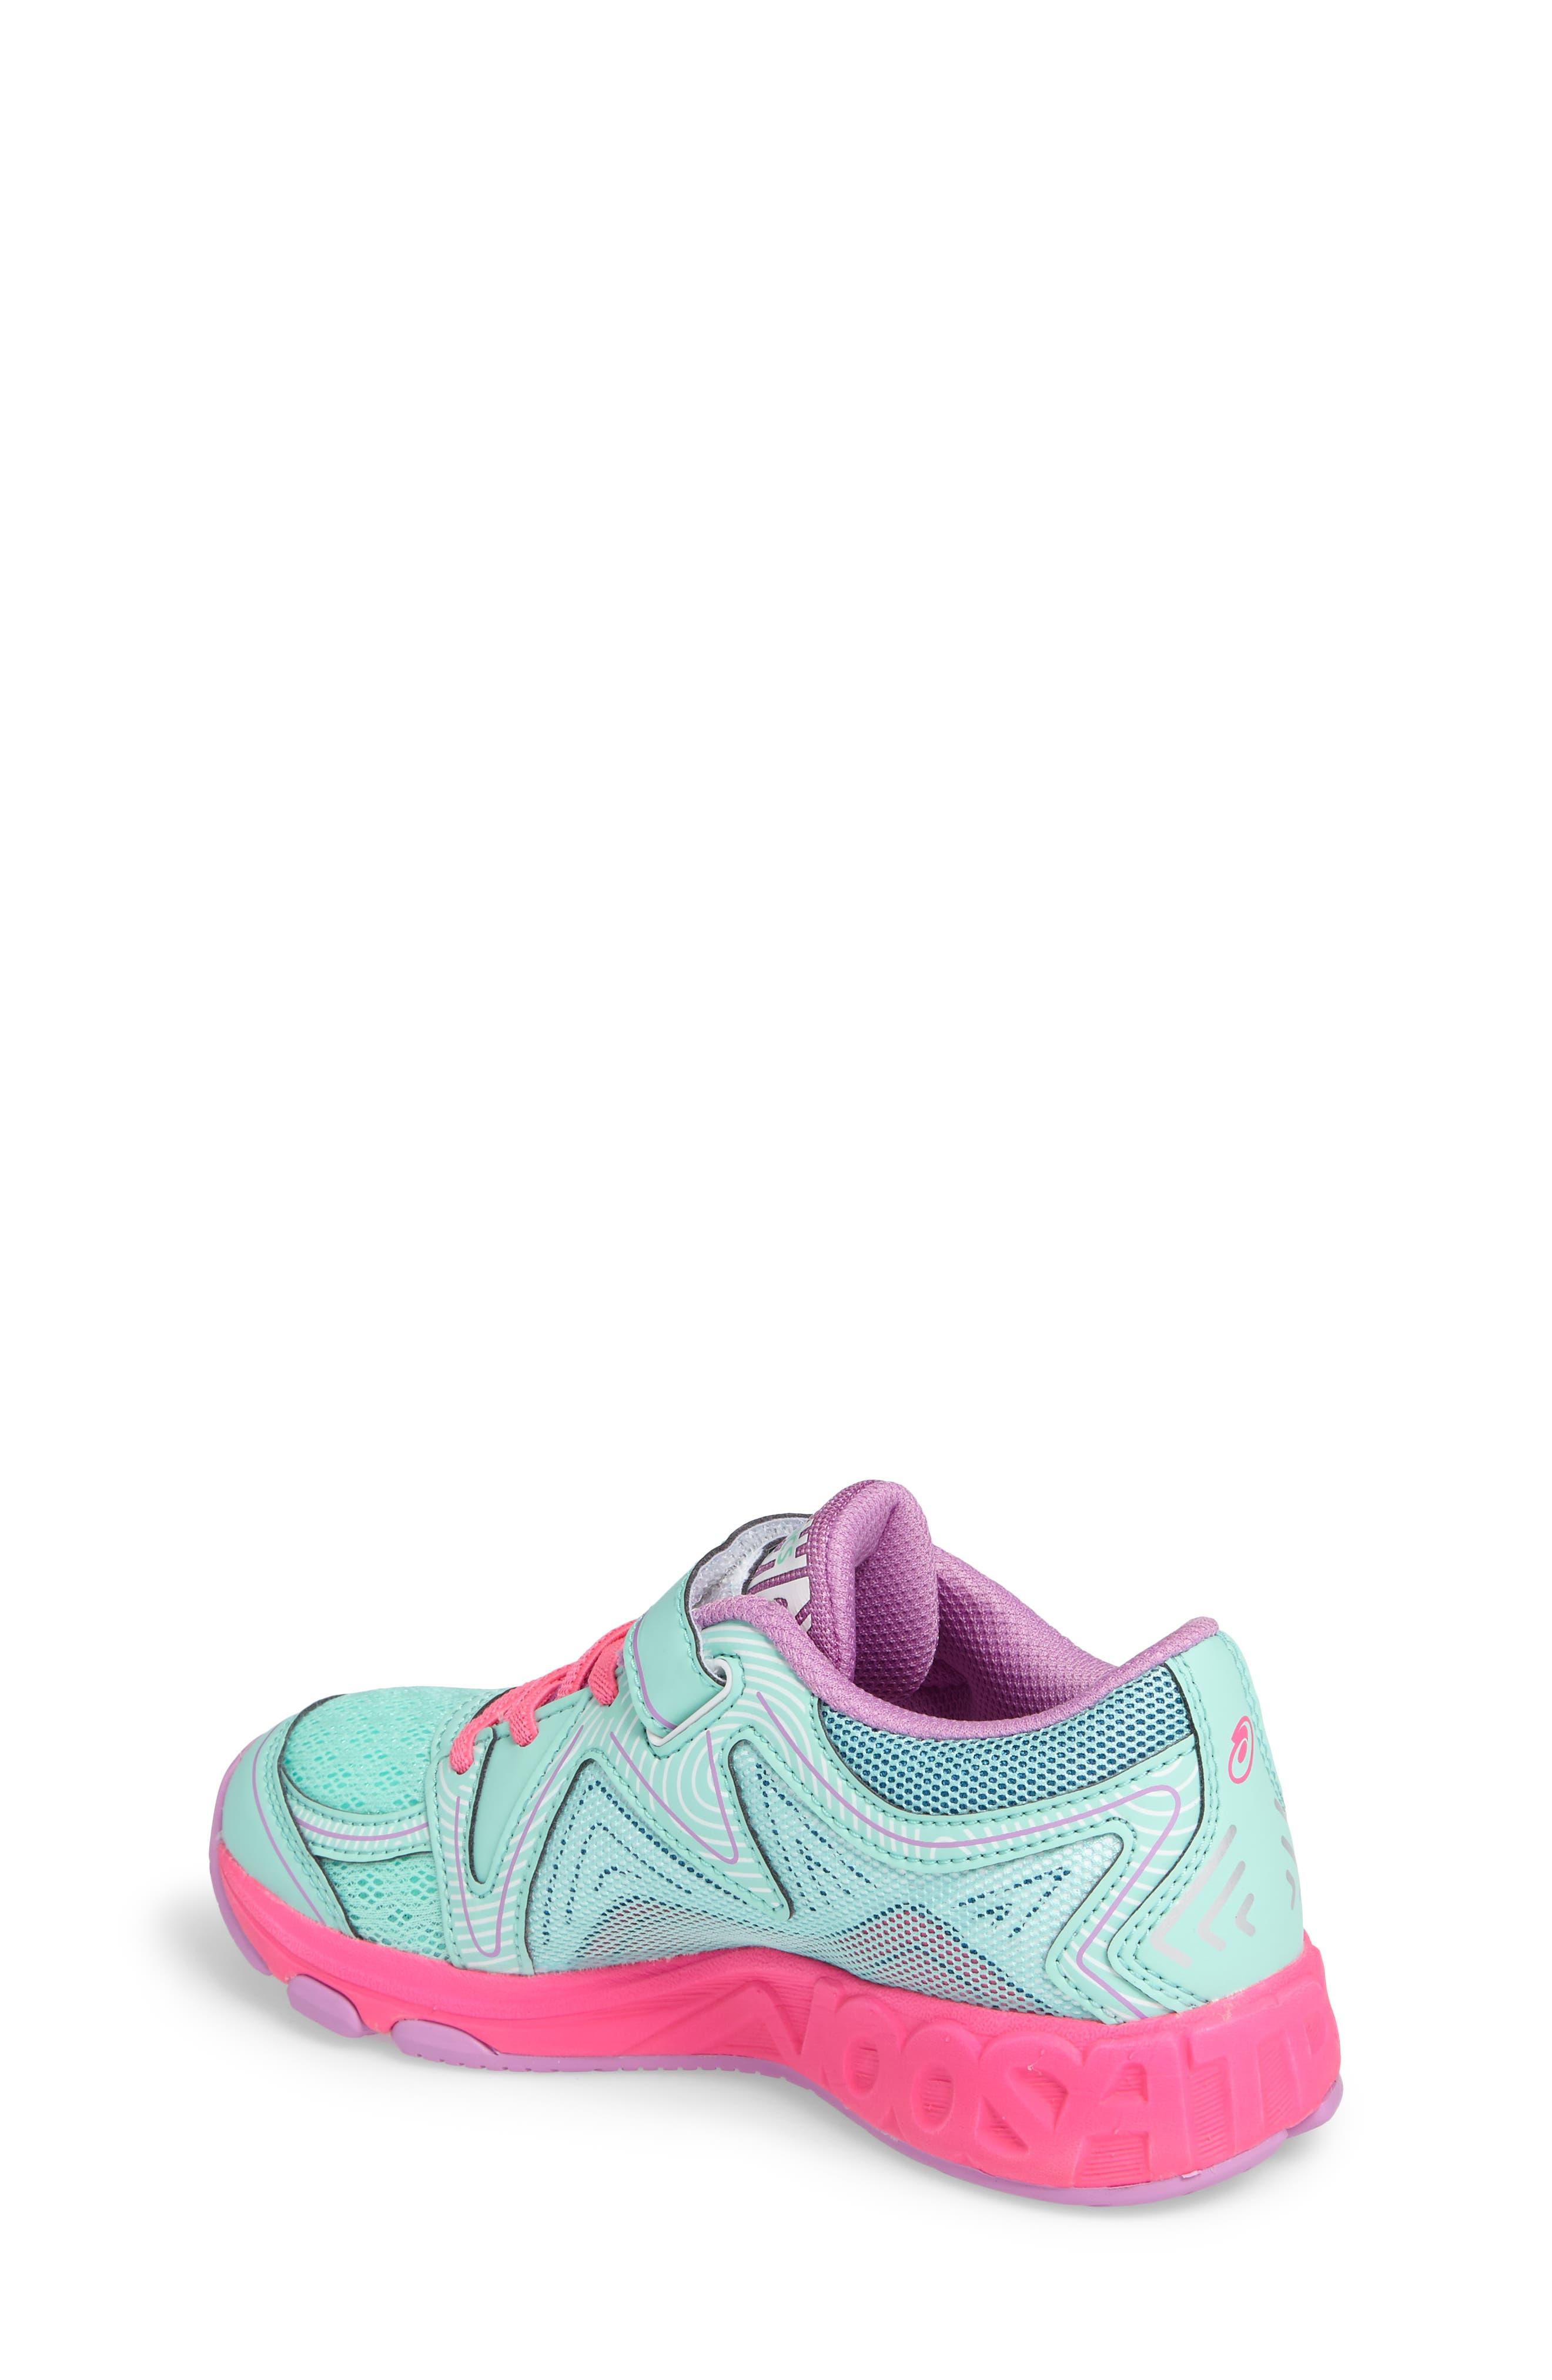 Noosa PS Sneaker,                             Alternate thumbnail 2, color,                             330